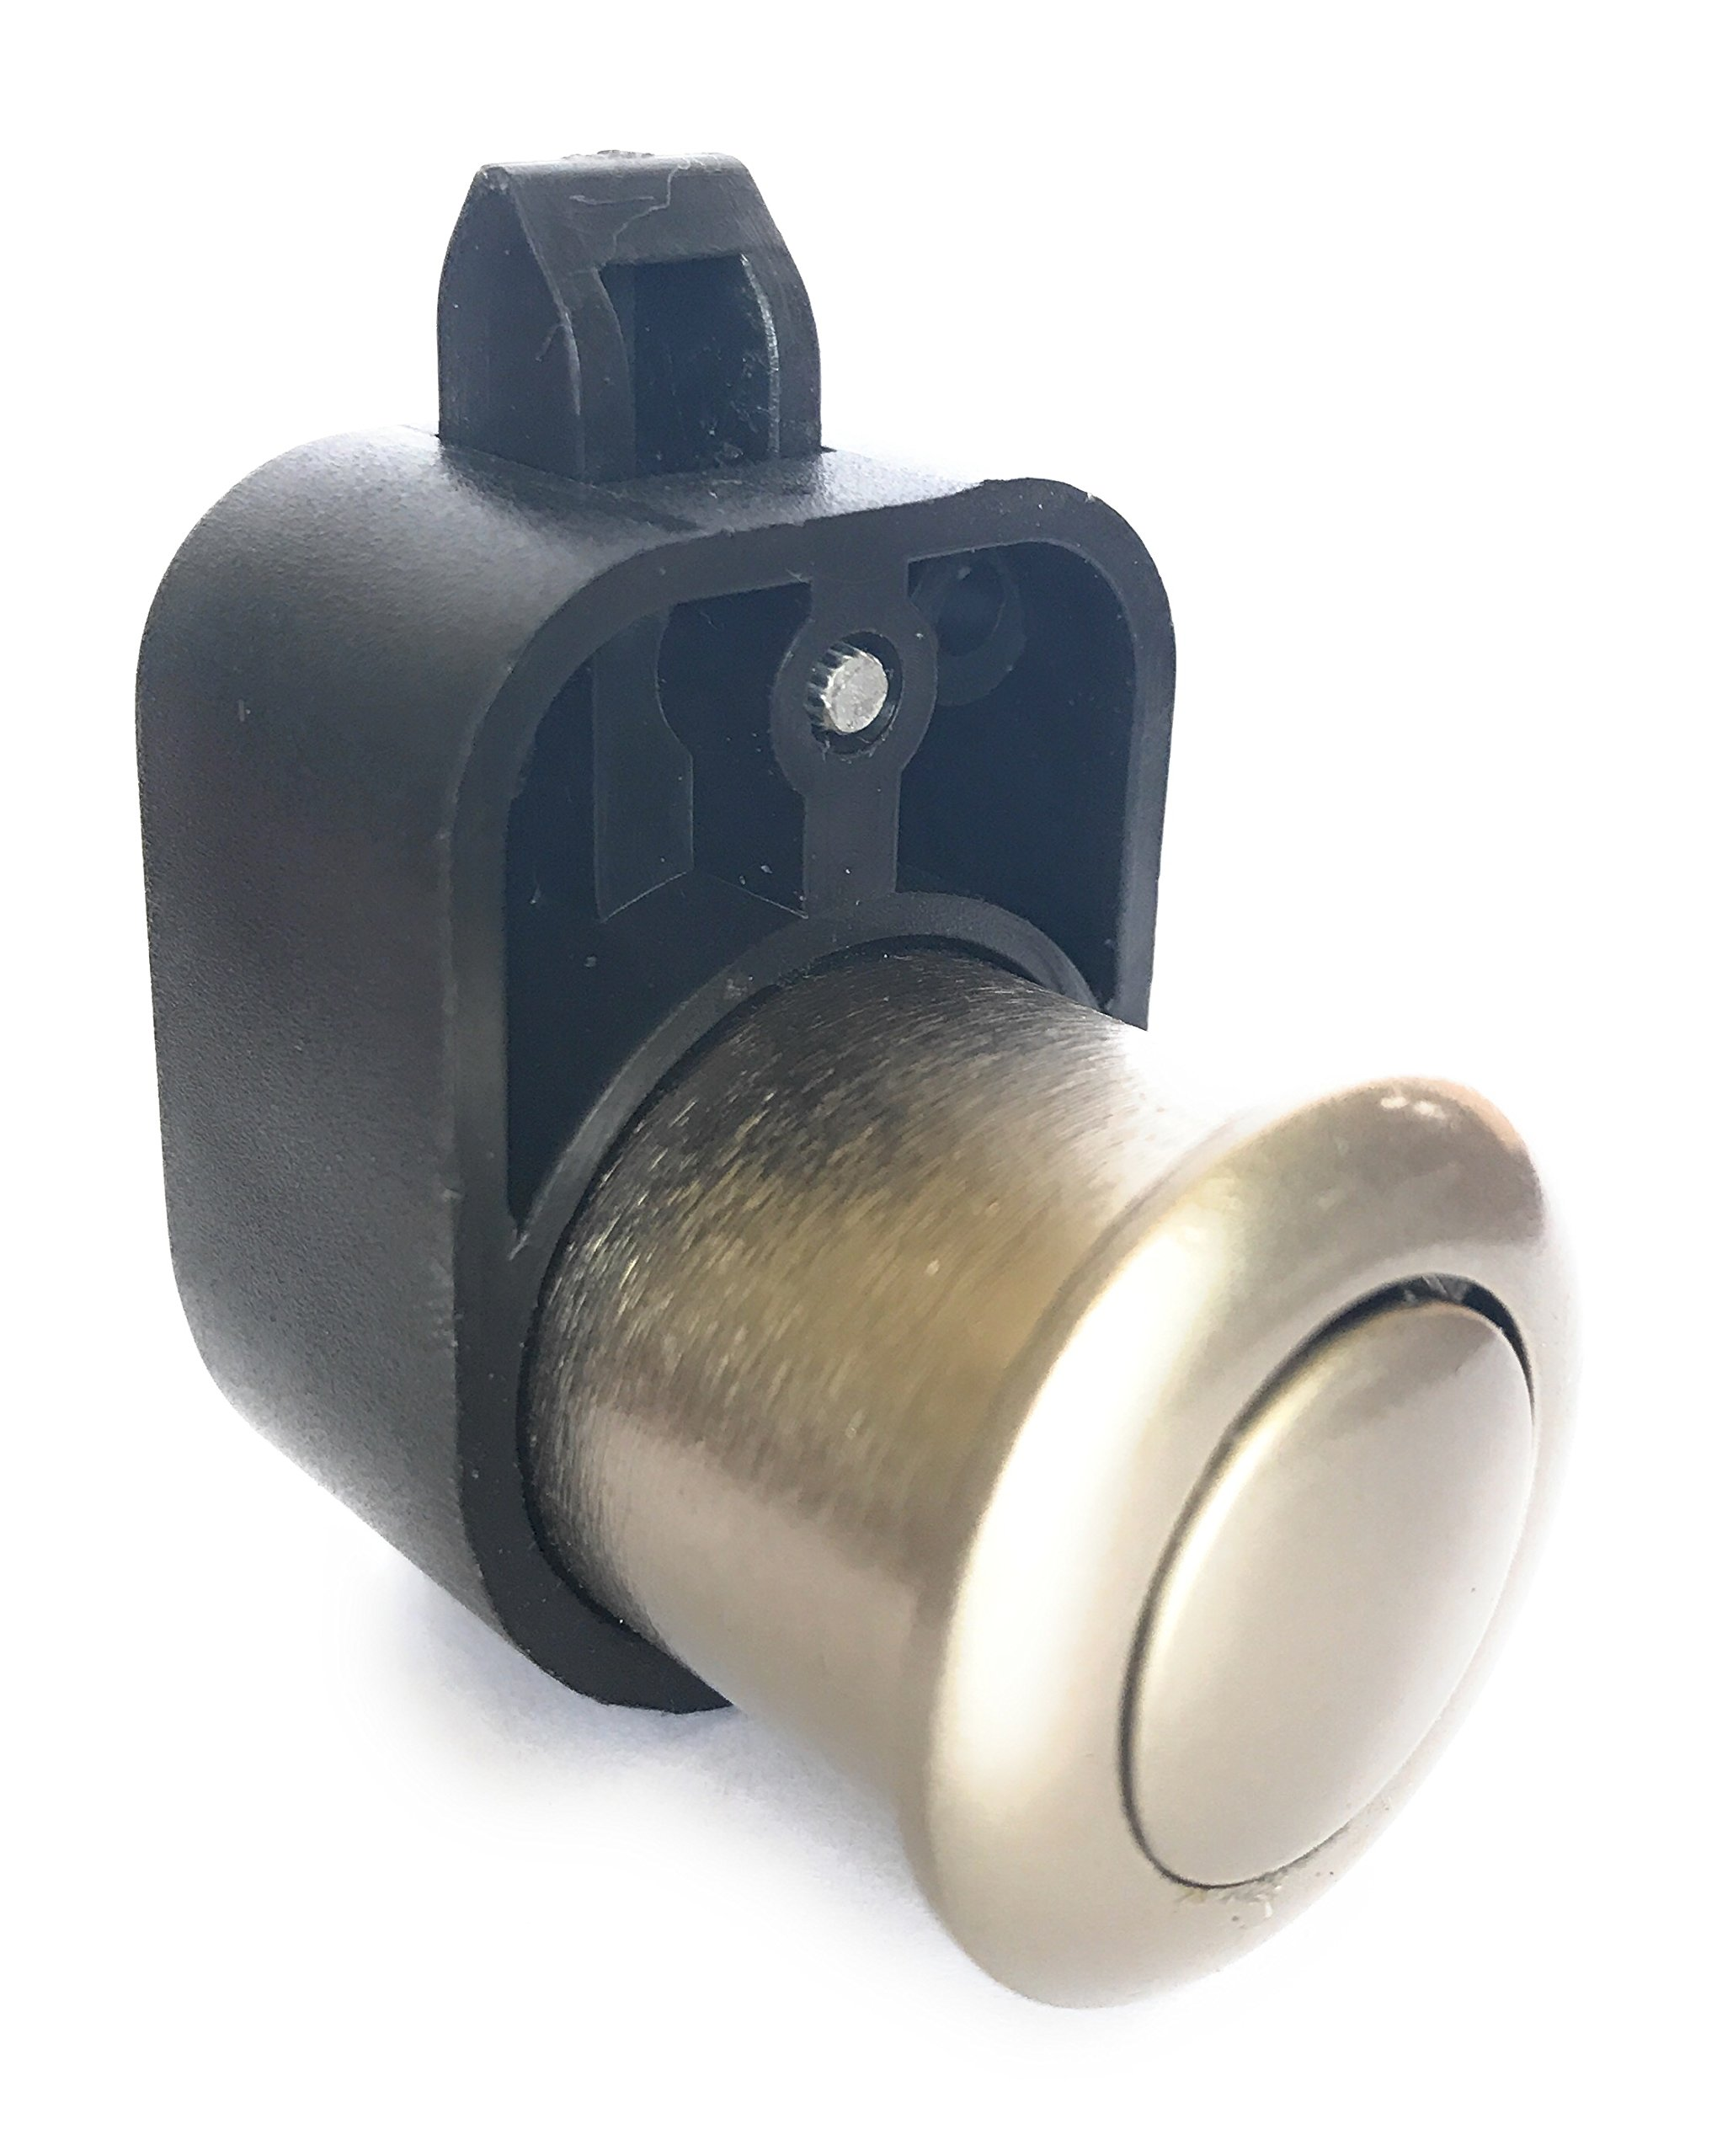 AMT Push Button Latch Lock Cupboard Door Knob Alloy Handle Nickel Plated for RV Campervan Caravan Motorhome Furniture (5)